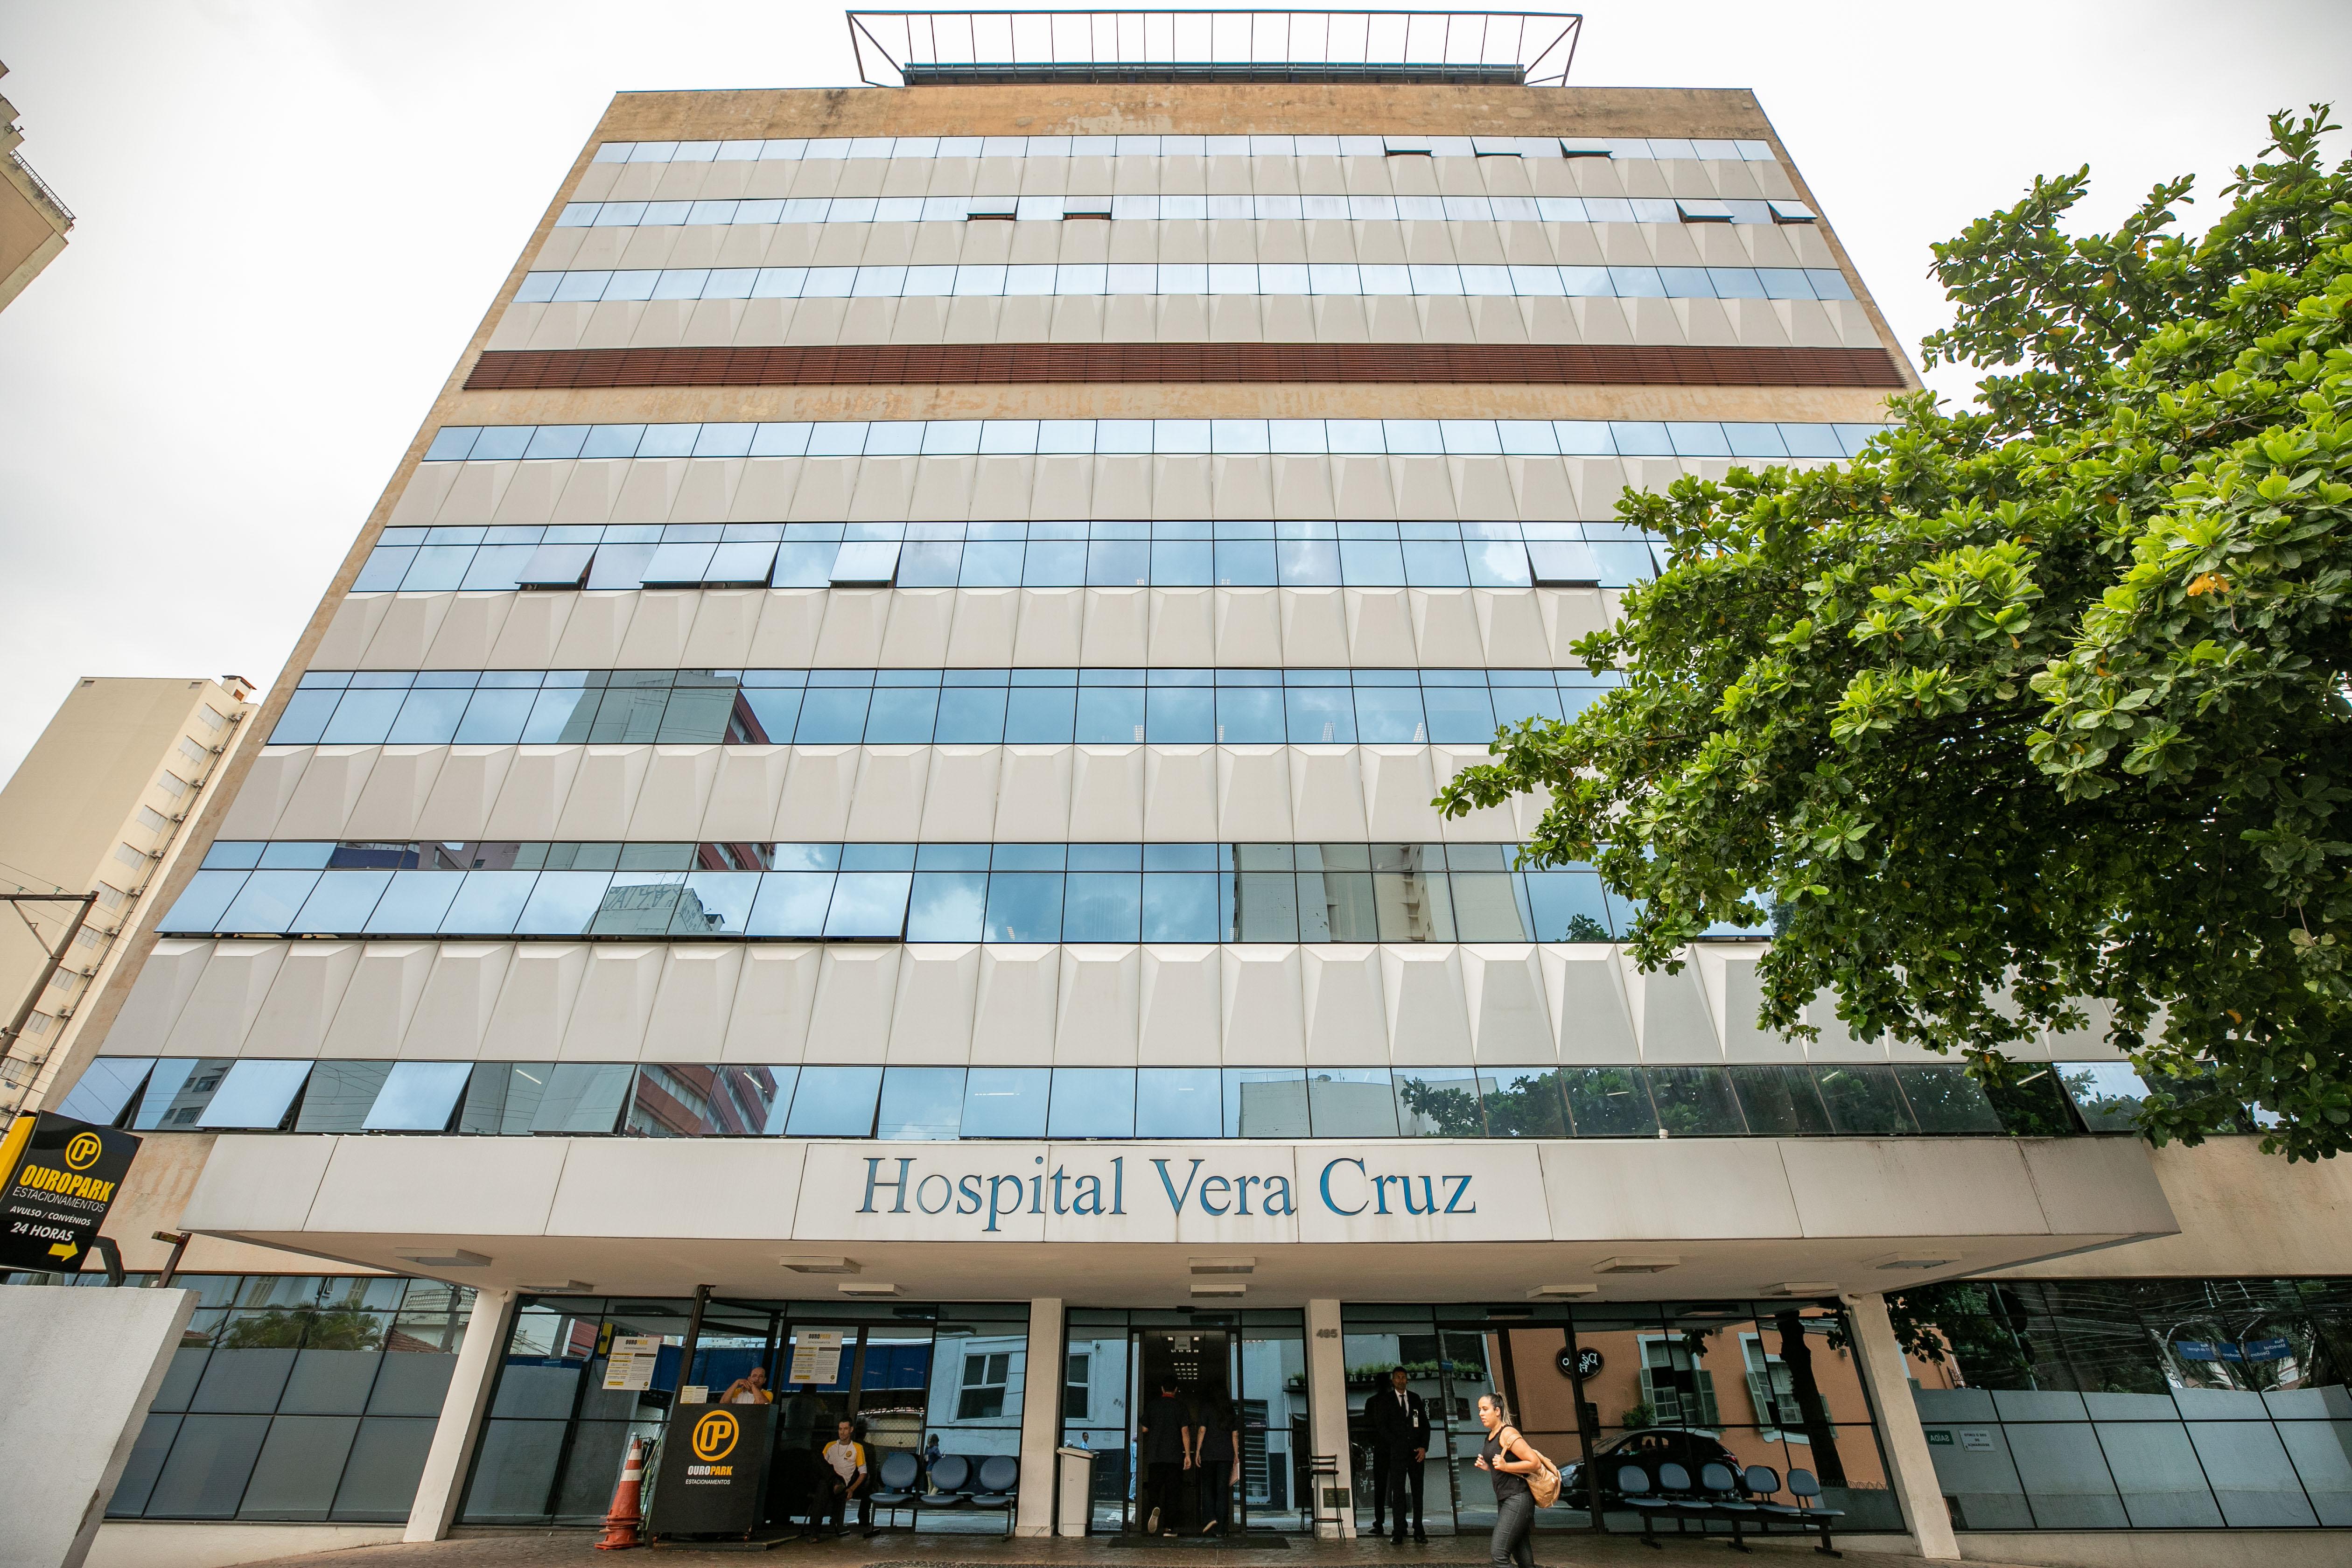 Fachada Hospital Vera Cruz